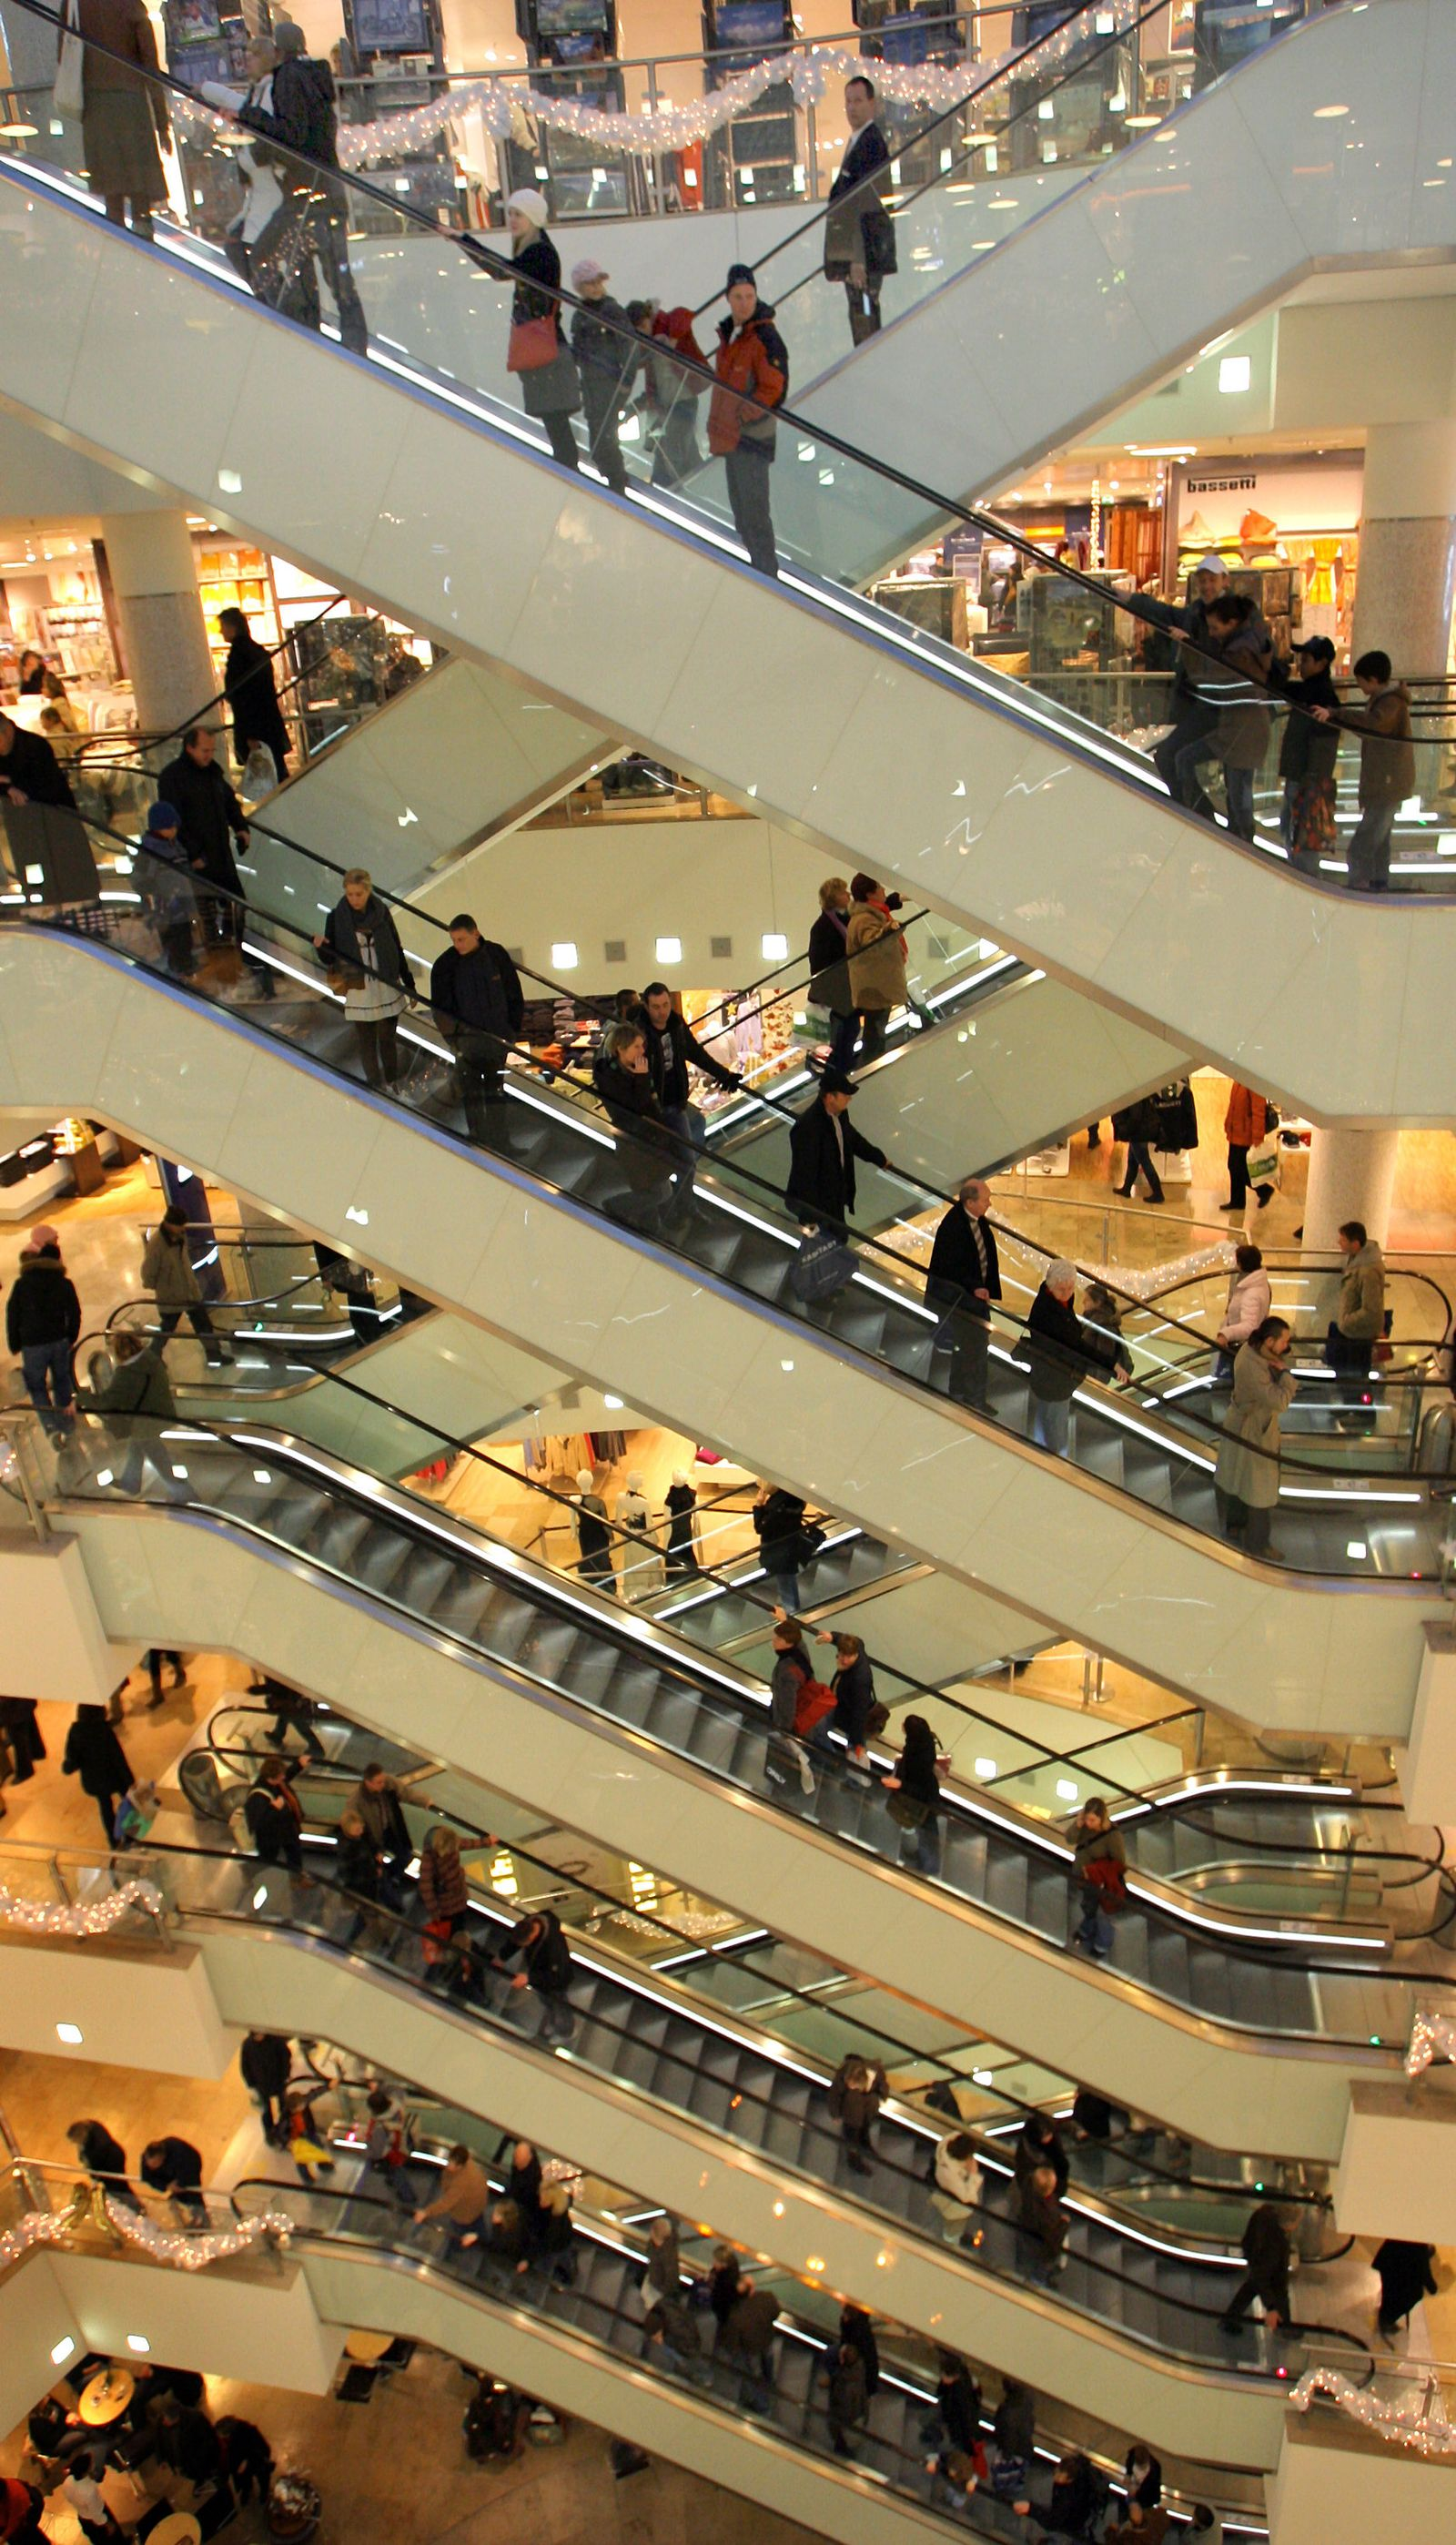 Konsum/ Konjunktur/ Verbraucher